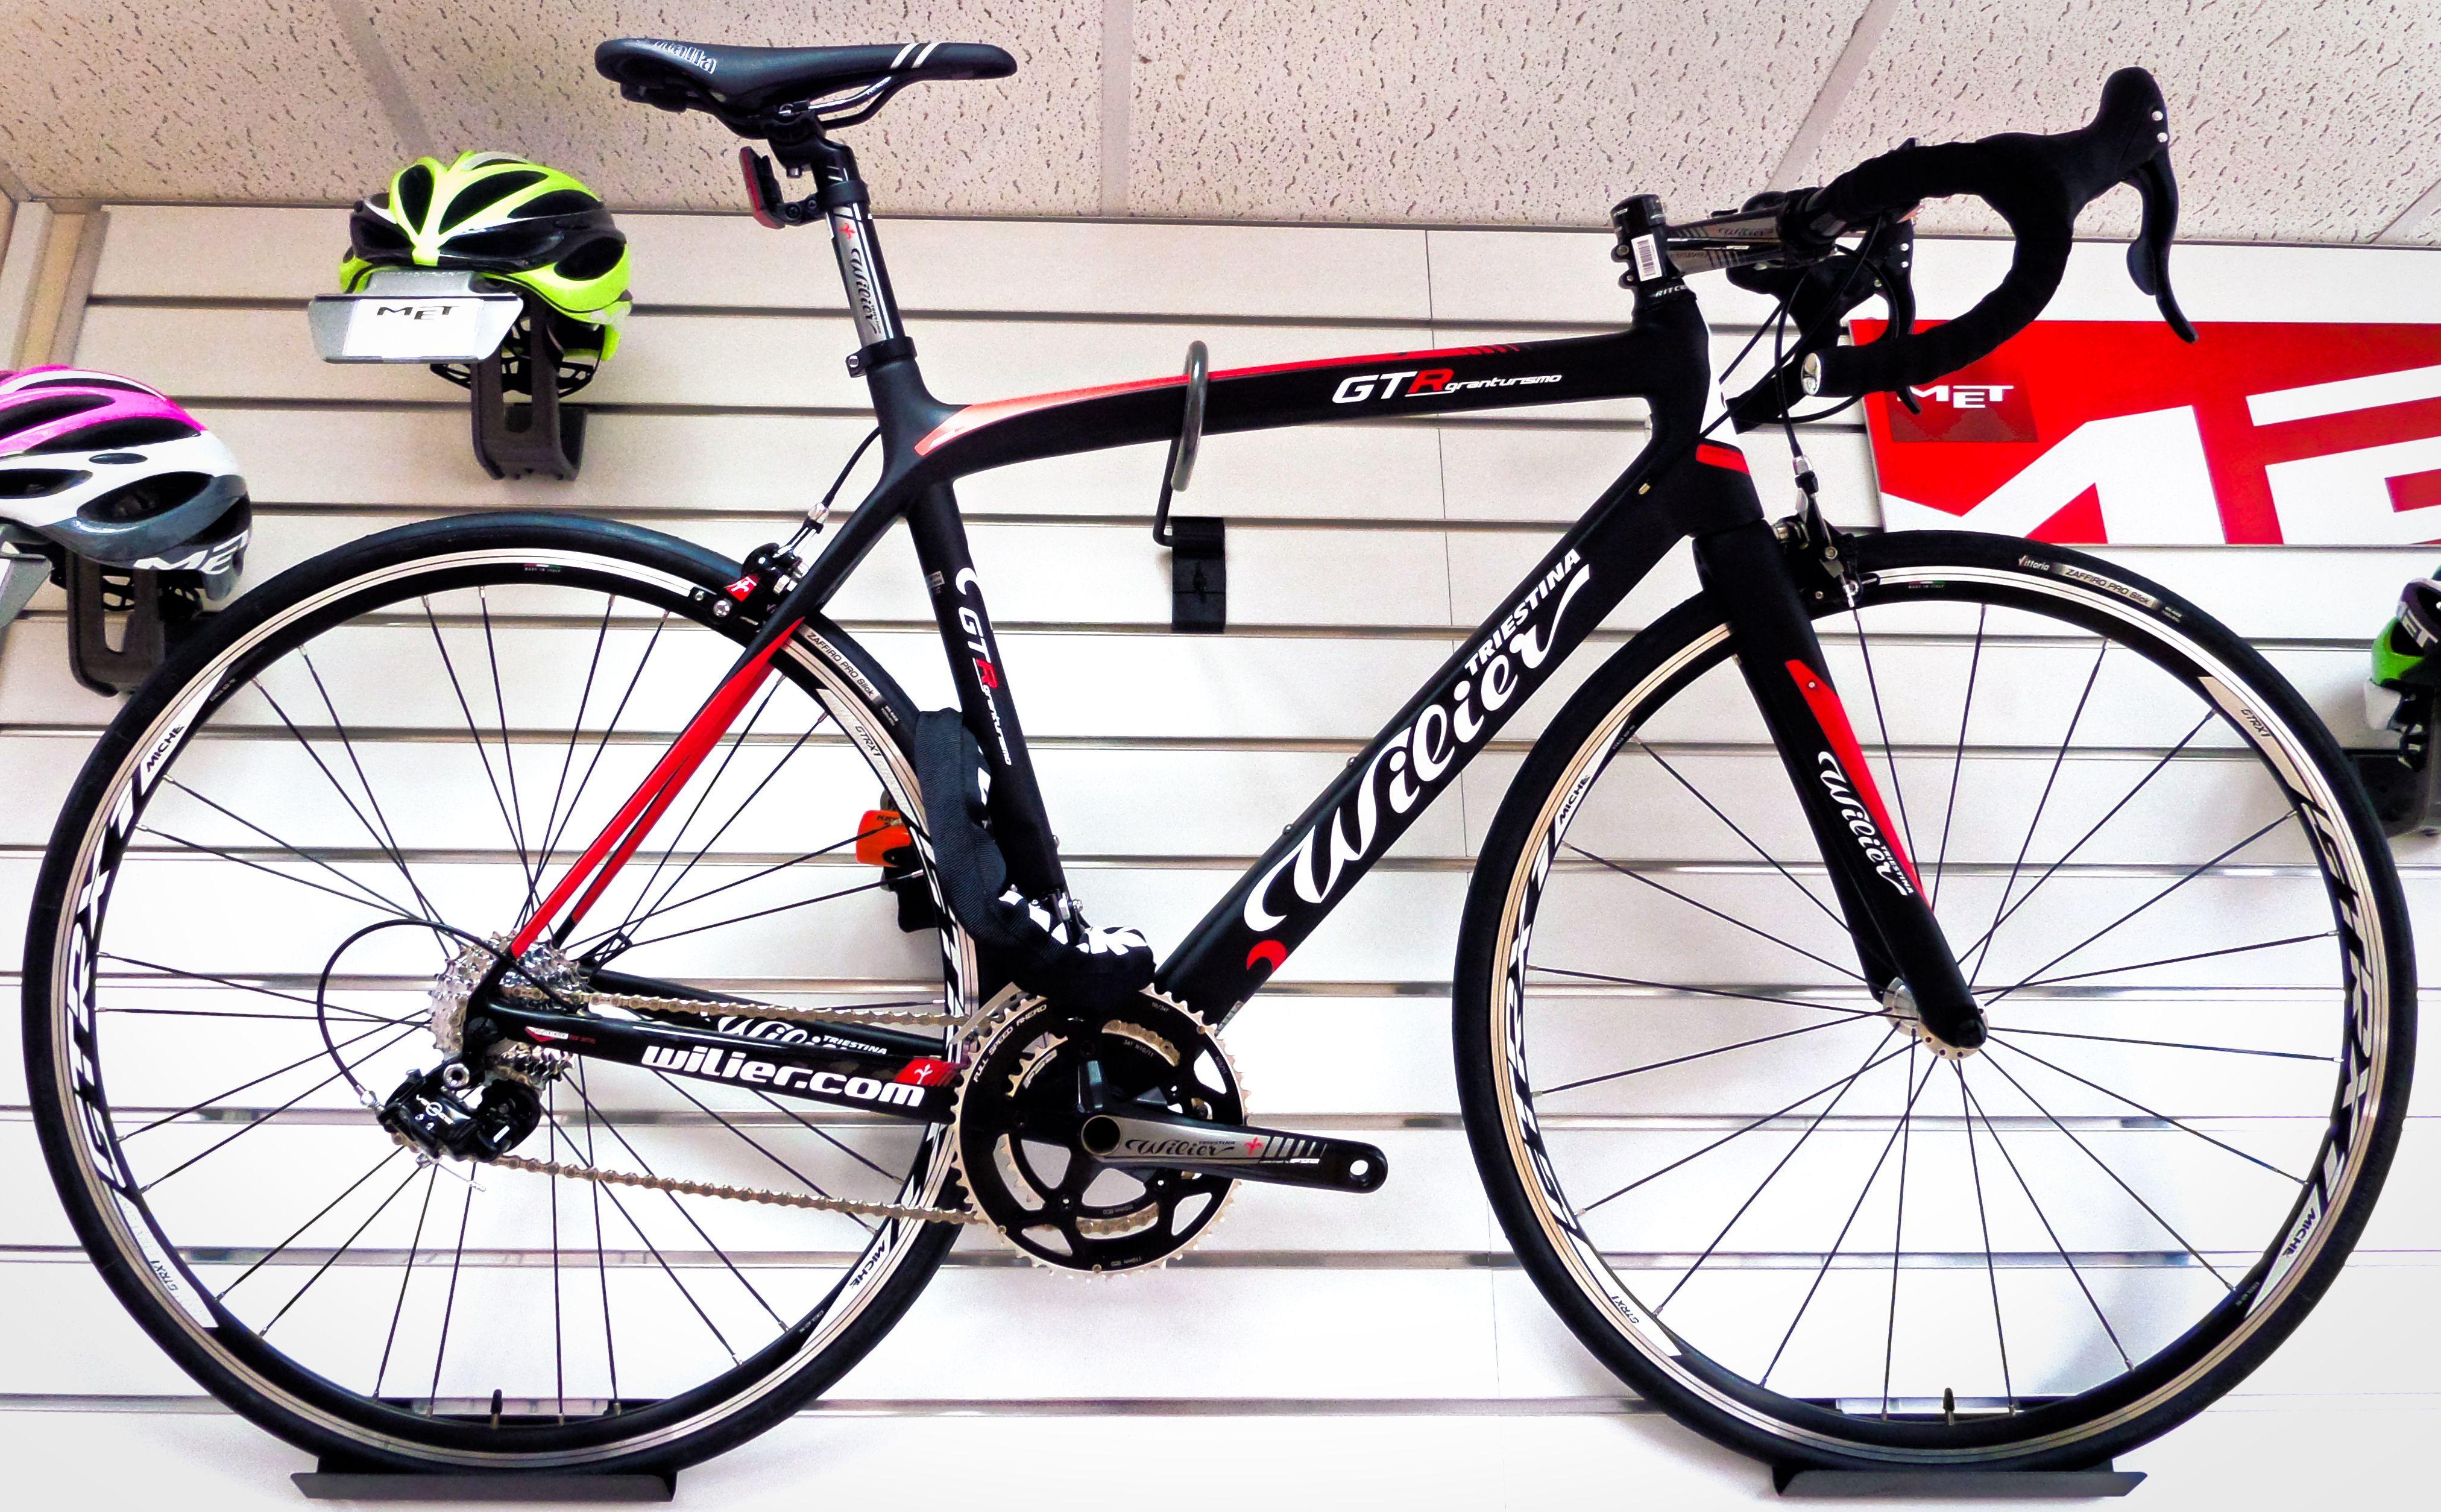 a85f9296878 2016 #Wilier GTR | Bikers | Bike, Road bike, Road cycling